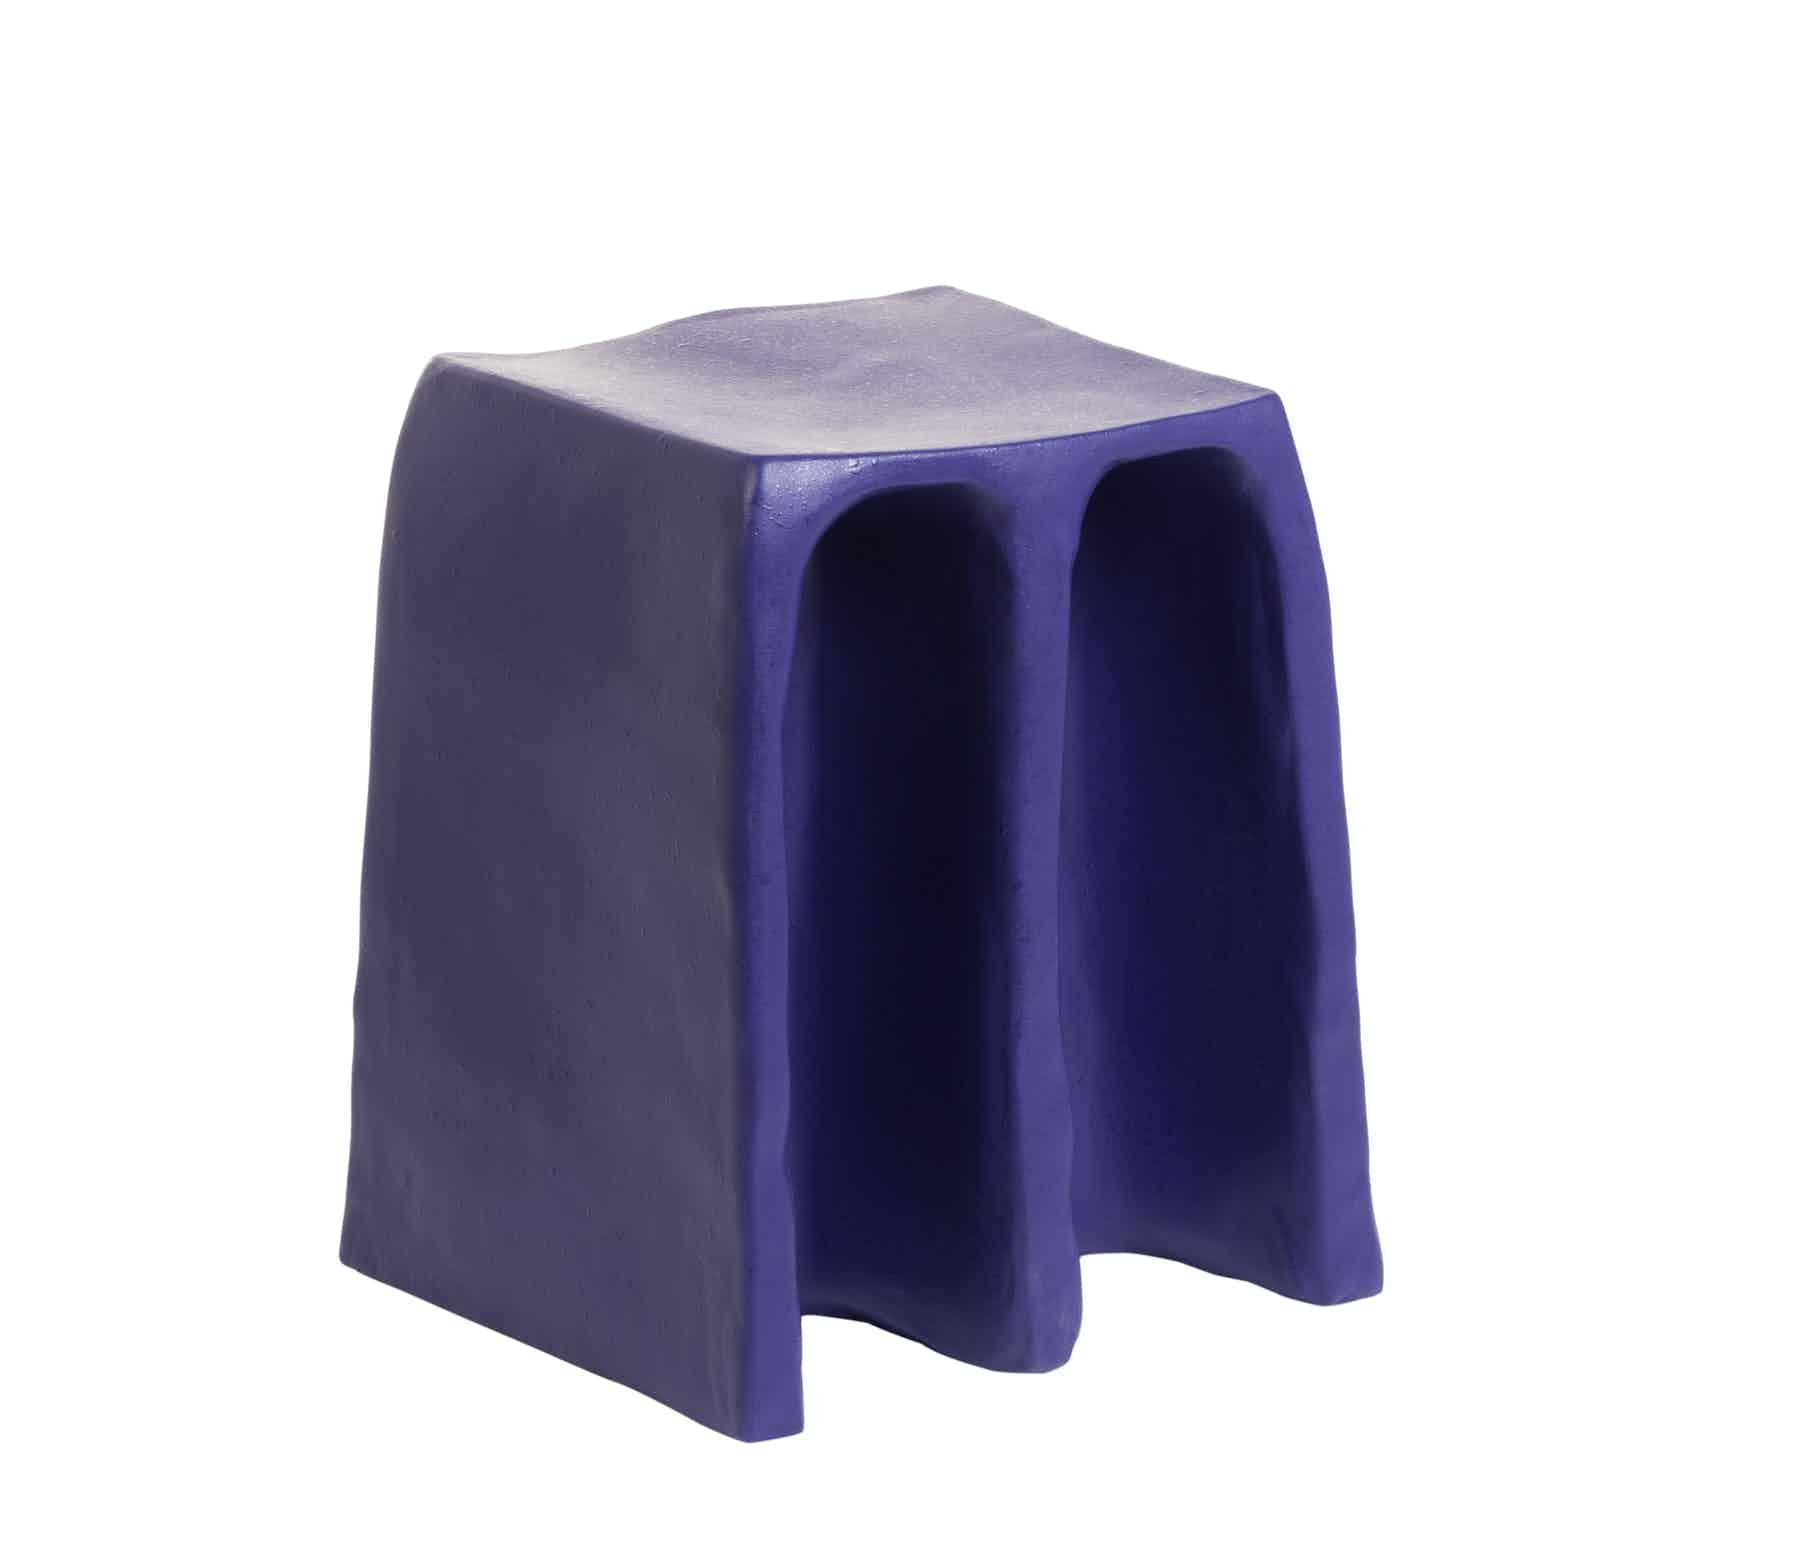 Pulpo-chouchou-stool-blue-haute-living